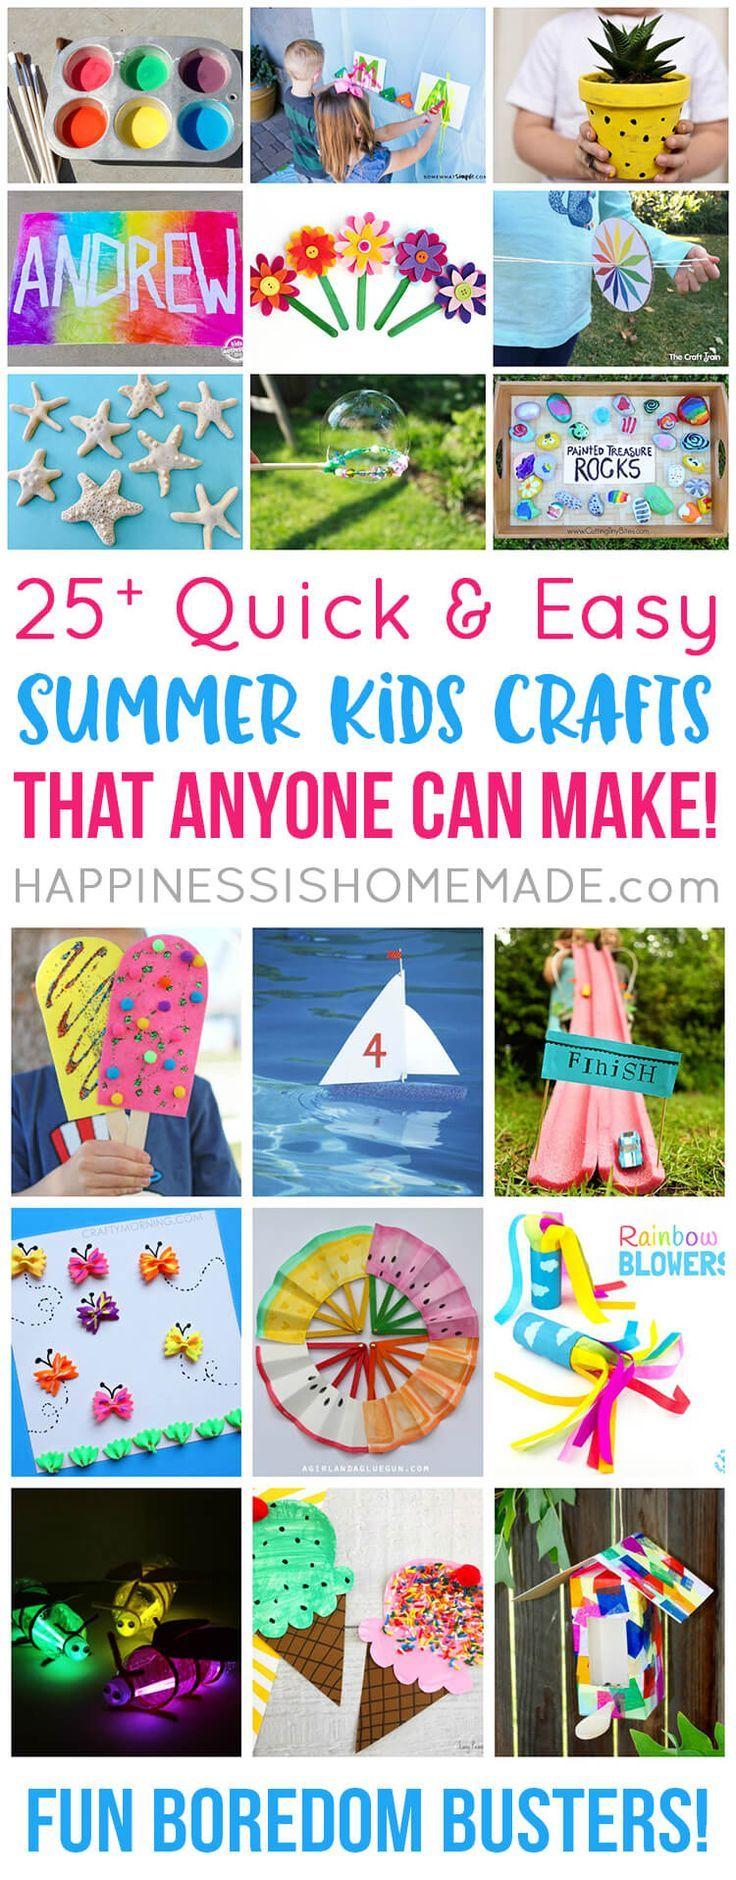 Best 25 Summer Kid Crafts Ideas On Pinterest Fireworks Craft in craft ideas 30 minutes with regard to Property